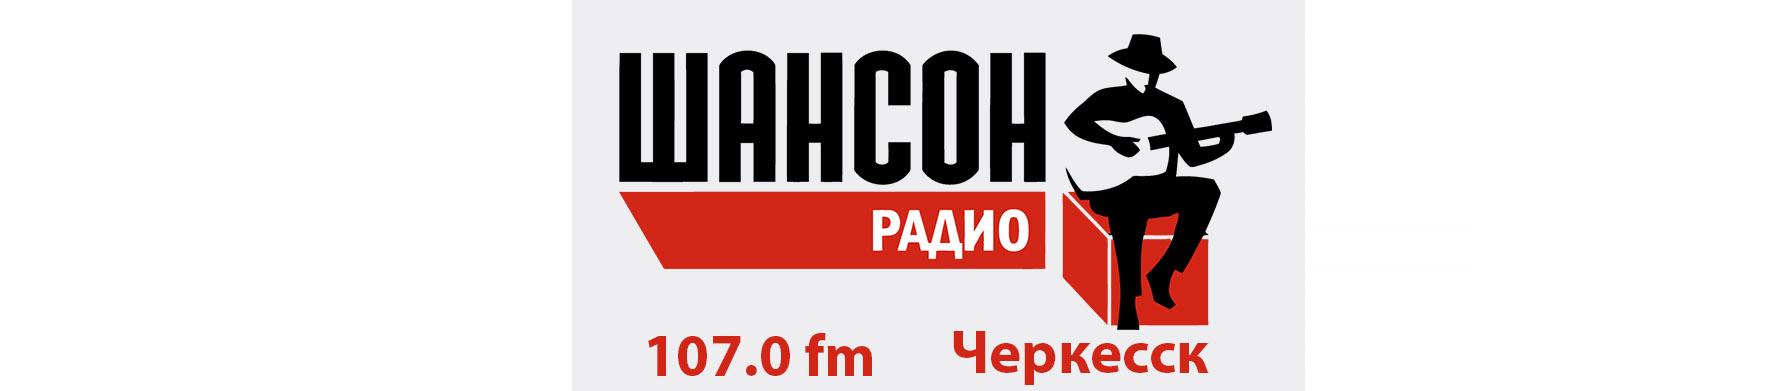 Реклама на радио в Карачаево-Черкессии Шансон